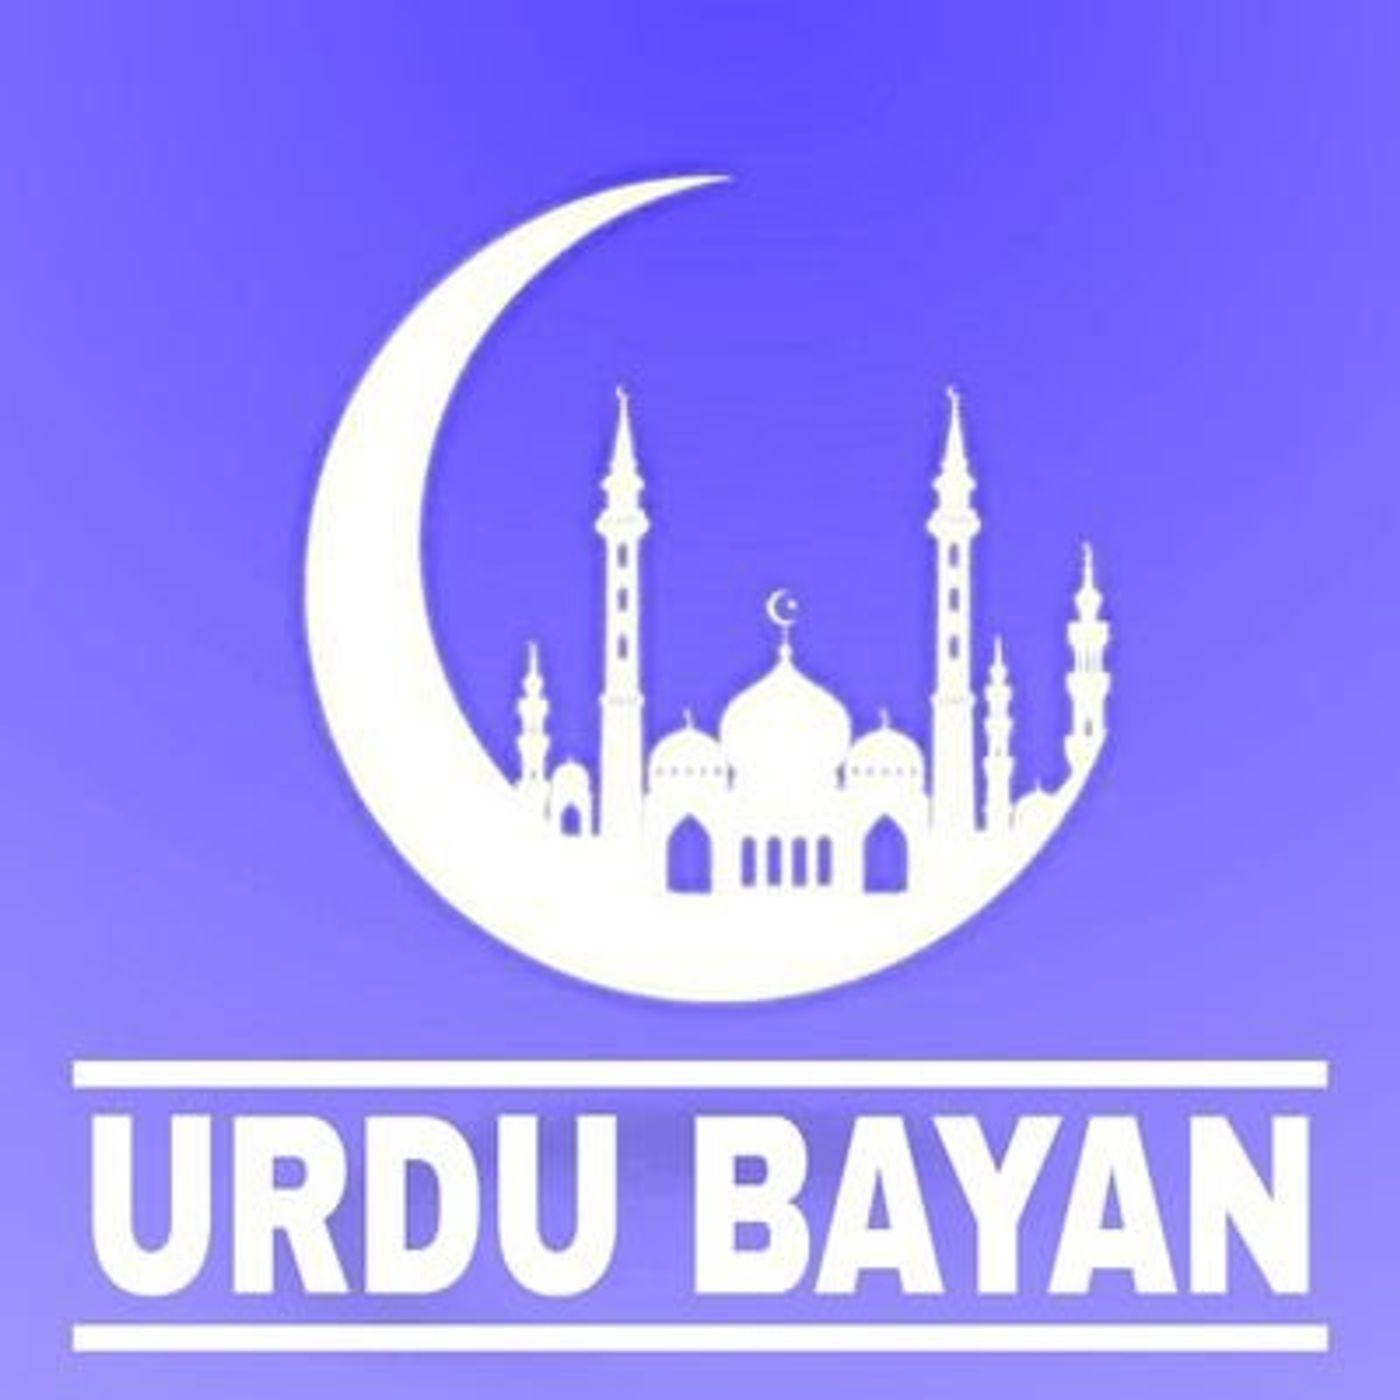 Urdu Bayan